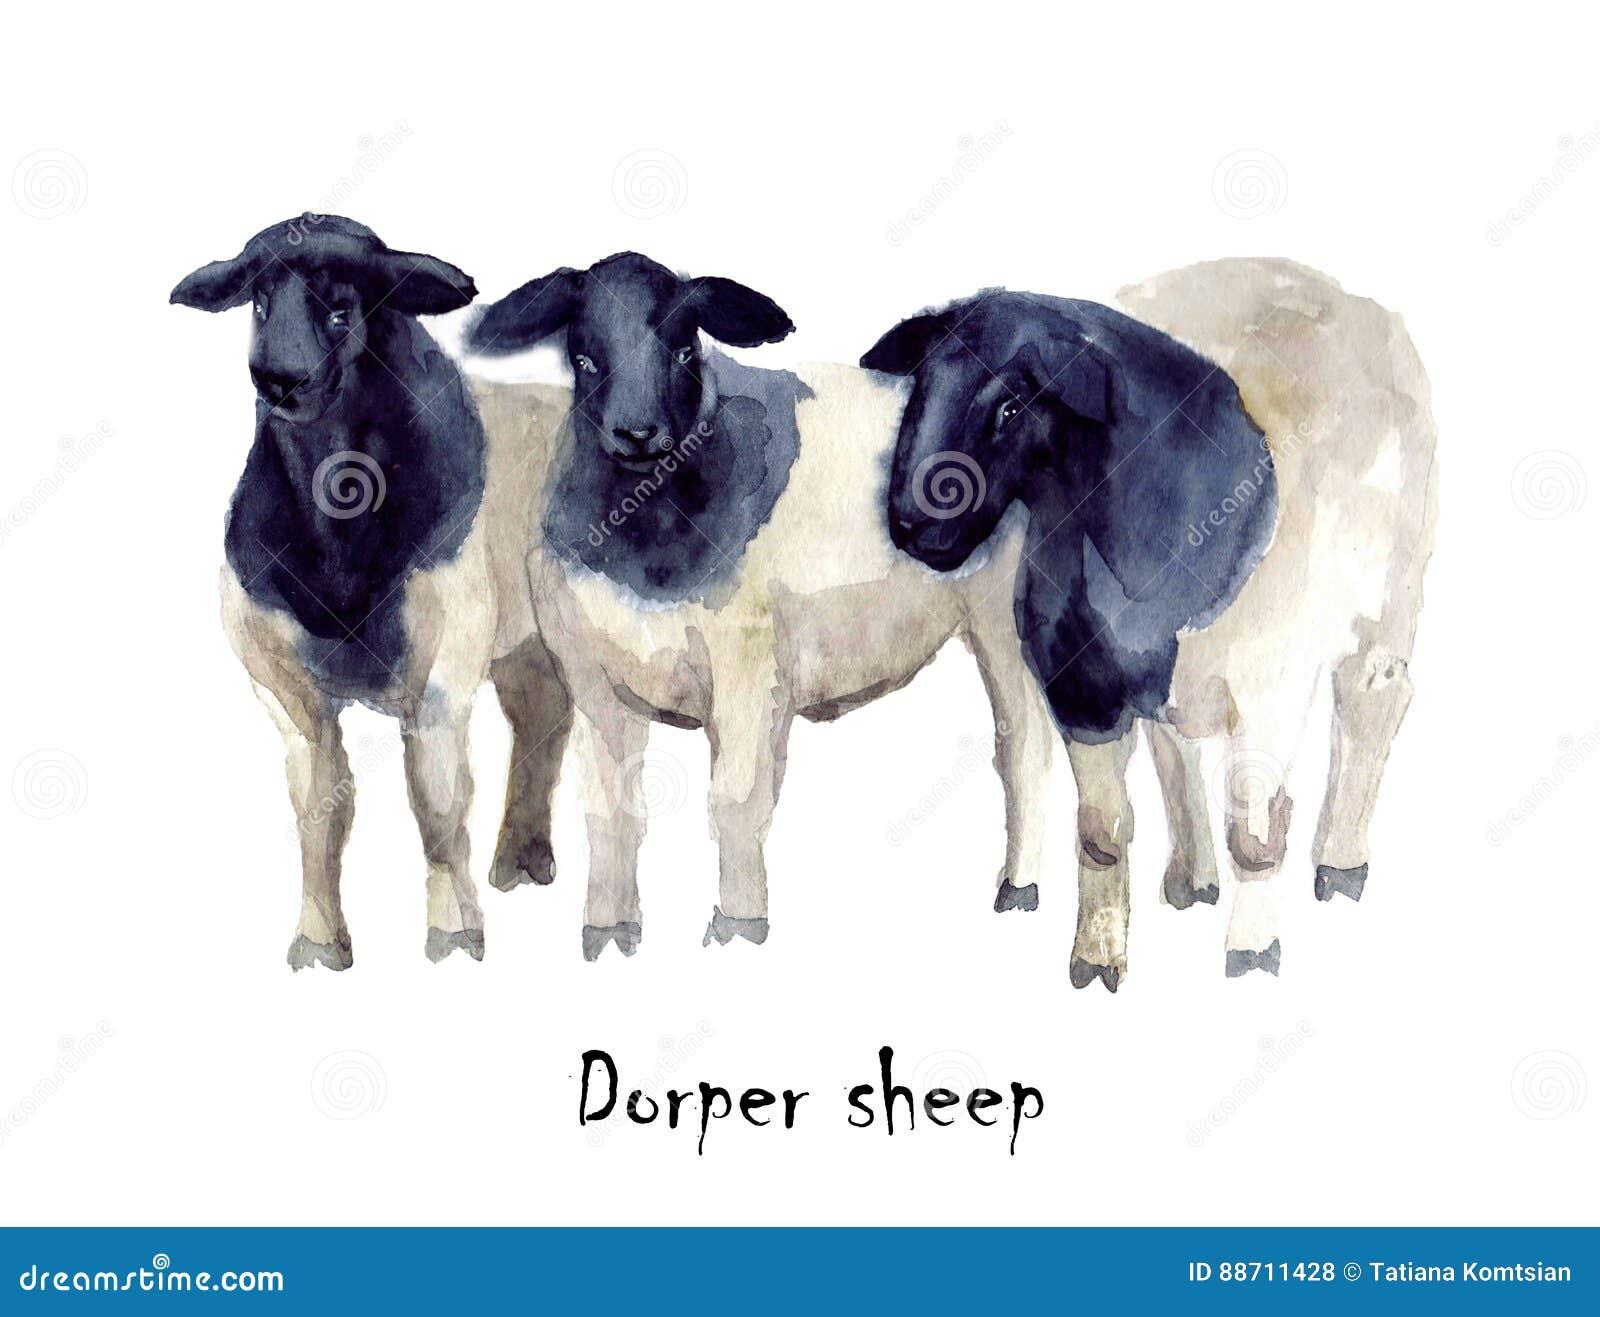 muslim singles in sheep ranch Sheep scanning jan 2018 dale farm thawing out sunshine, snow, single ewes lambing prep / sheep sorting - duration semper grazing ranch.